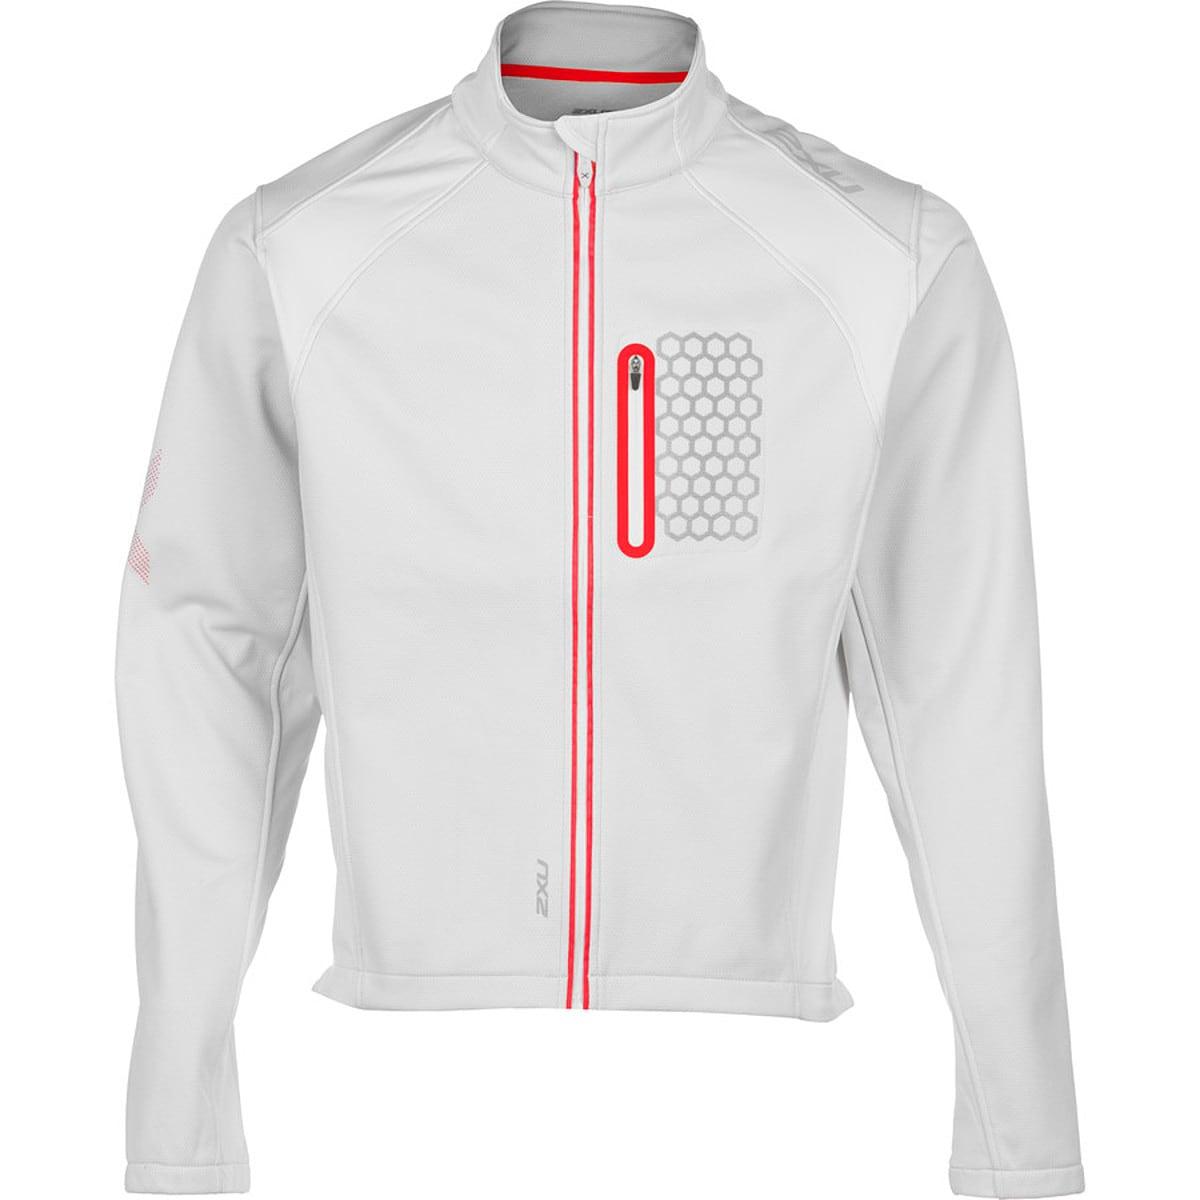 2XU Sub Zero 360 Cycle Jacket - Men's - Men's